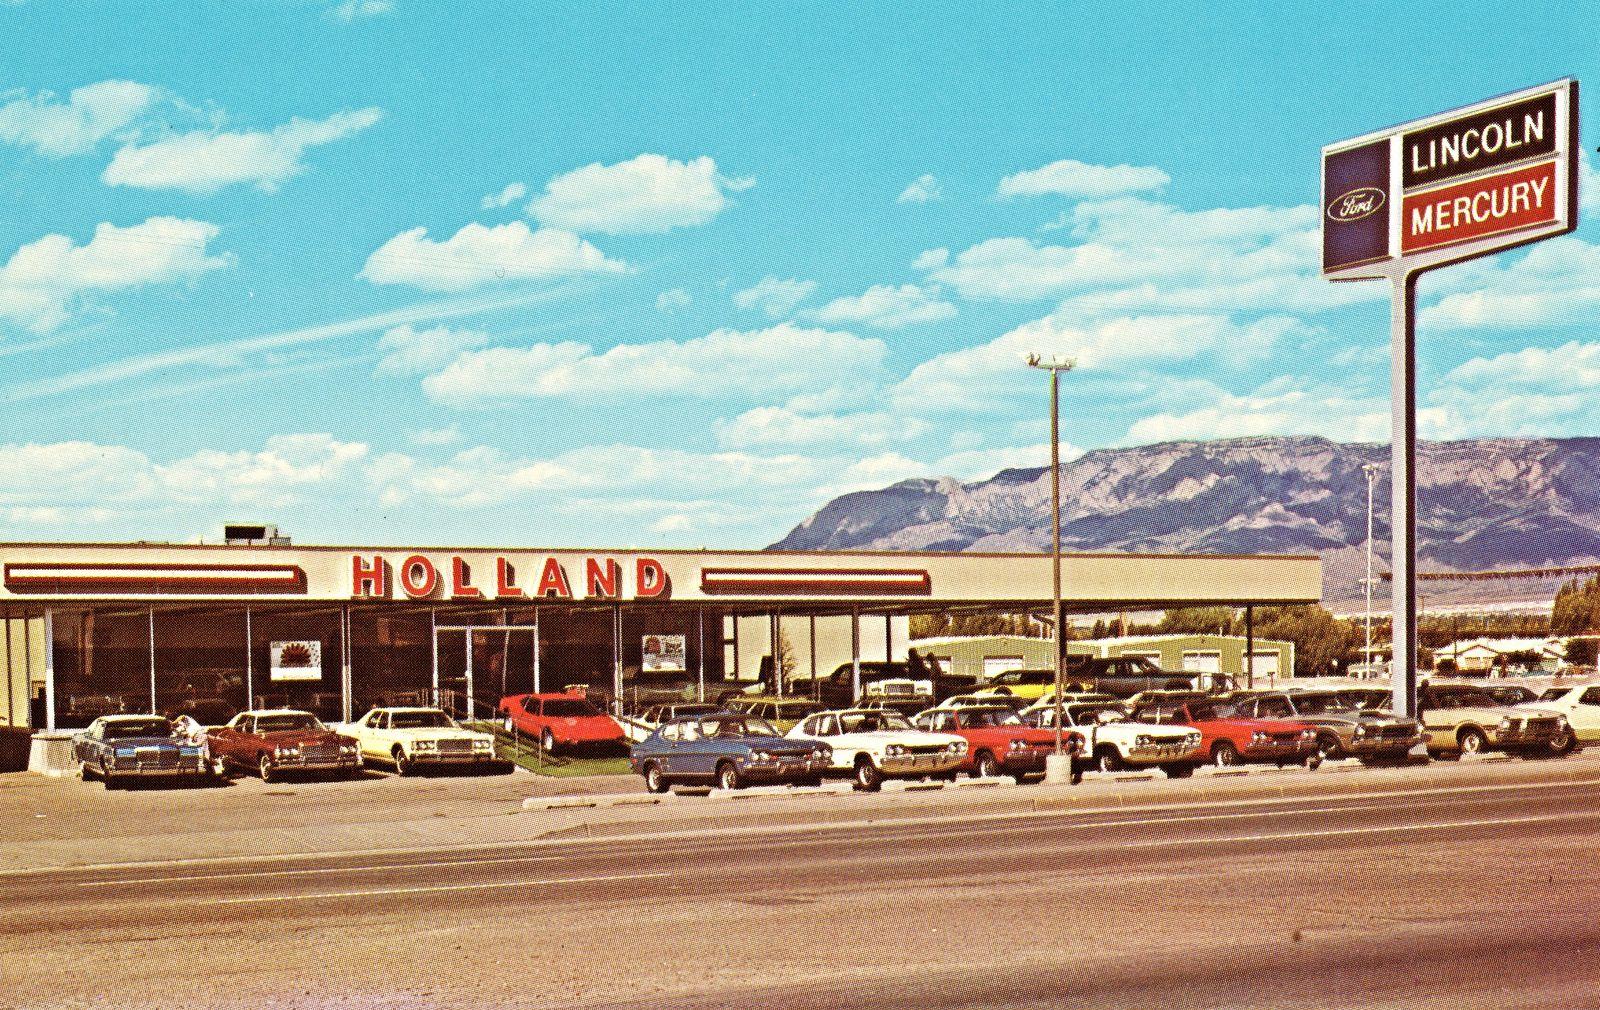 Holland Lincoln Mercury Albuquerque Nm 1973 Lincoln Mercury Albuquerque New Mexico